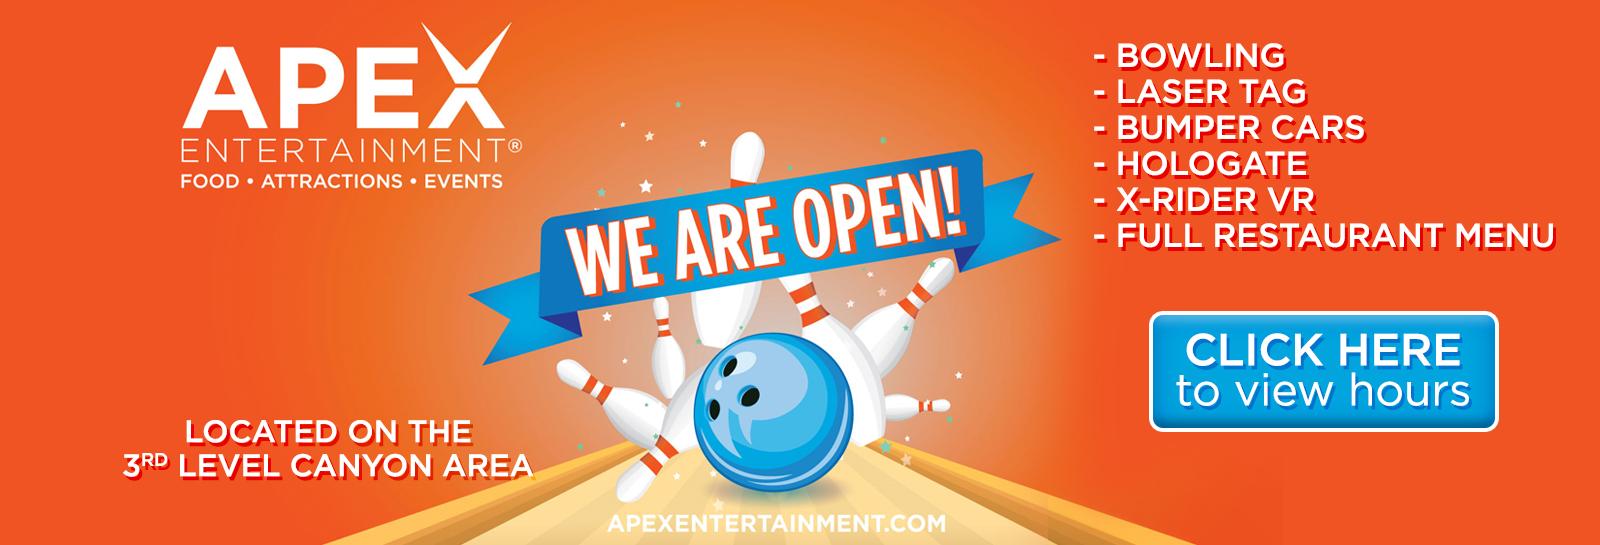 2020 10 06 APEX now open slider 1